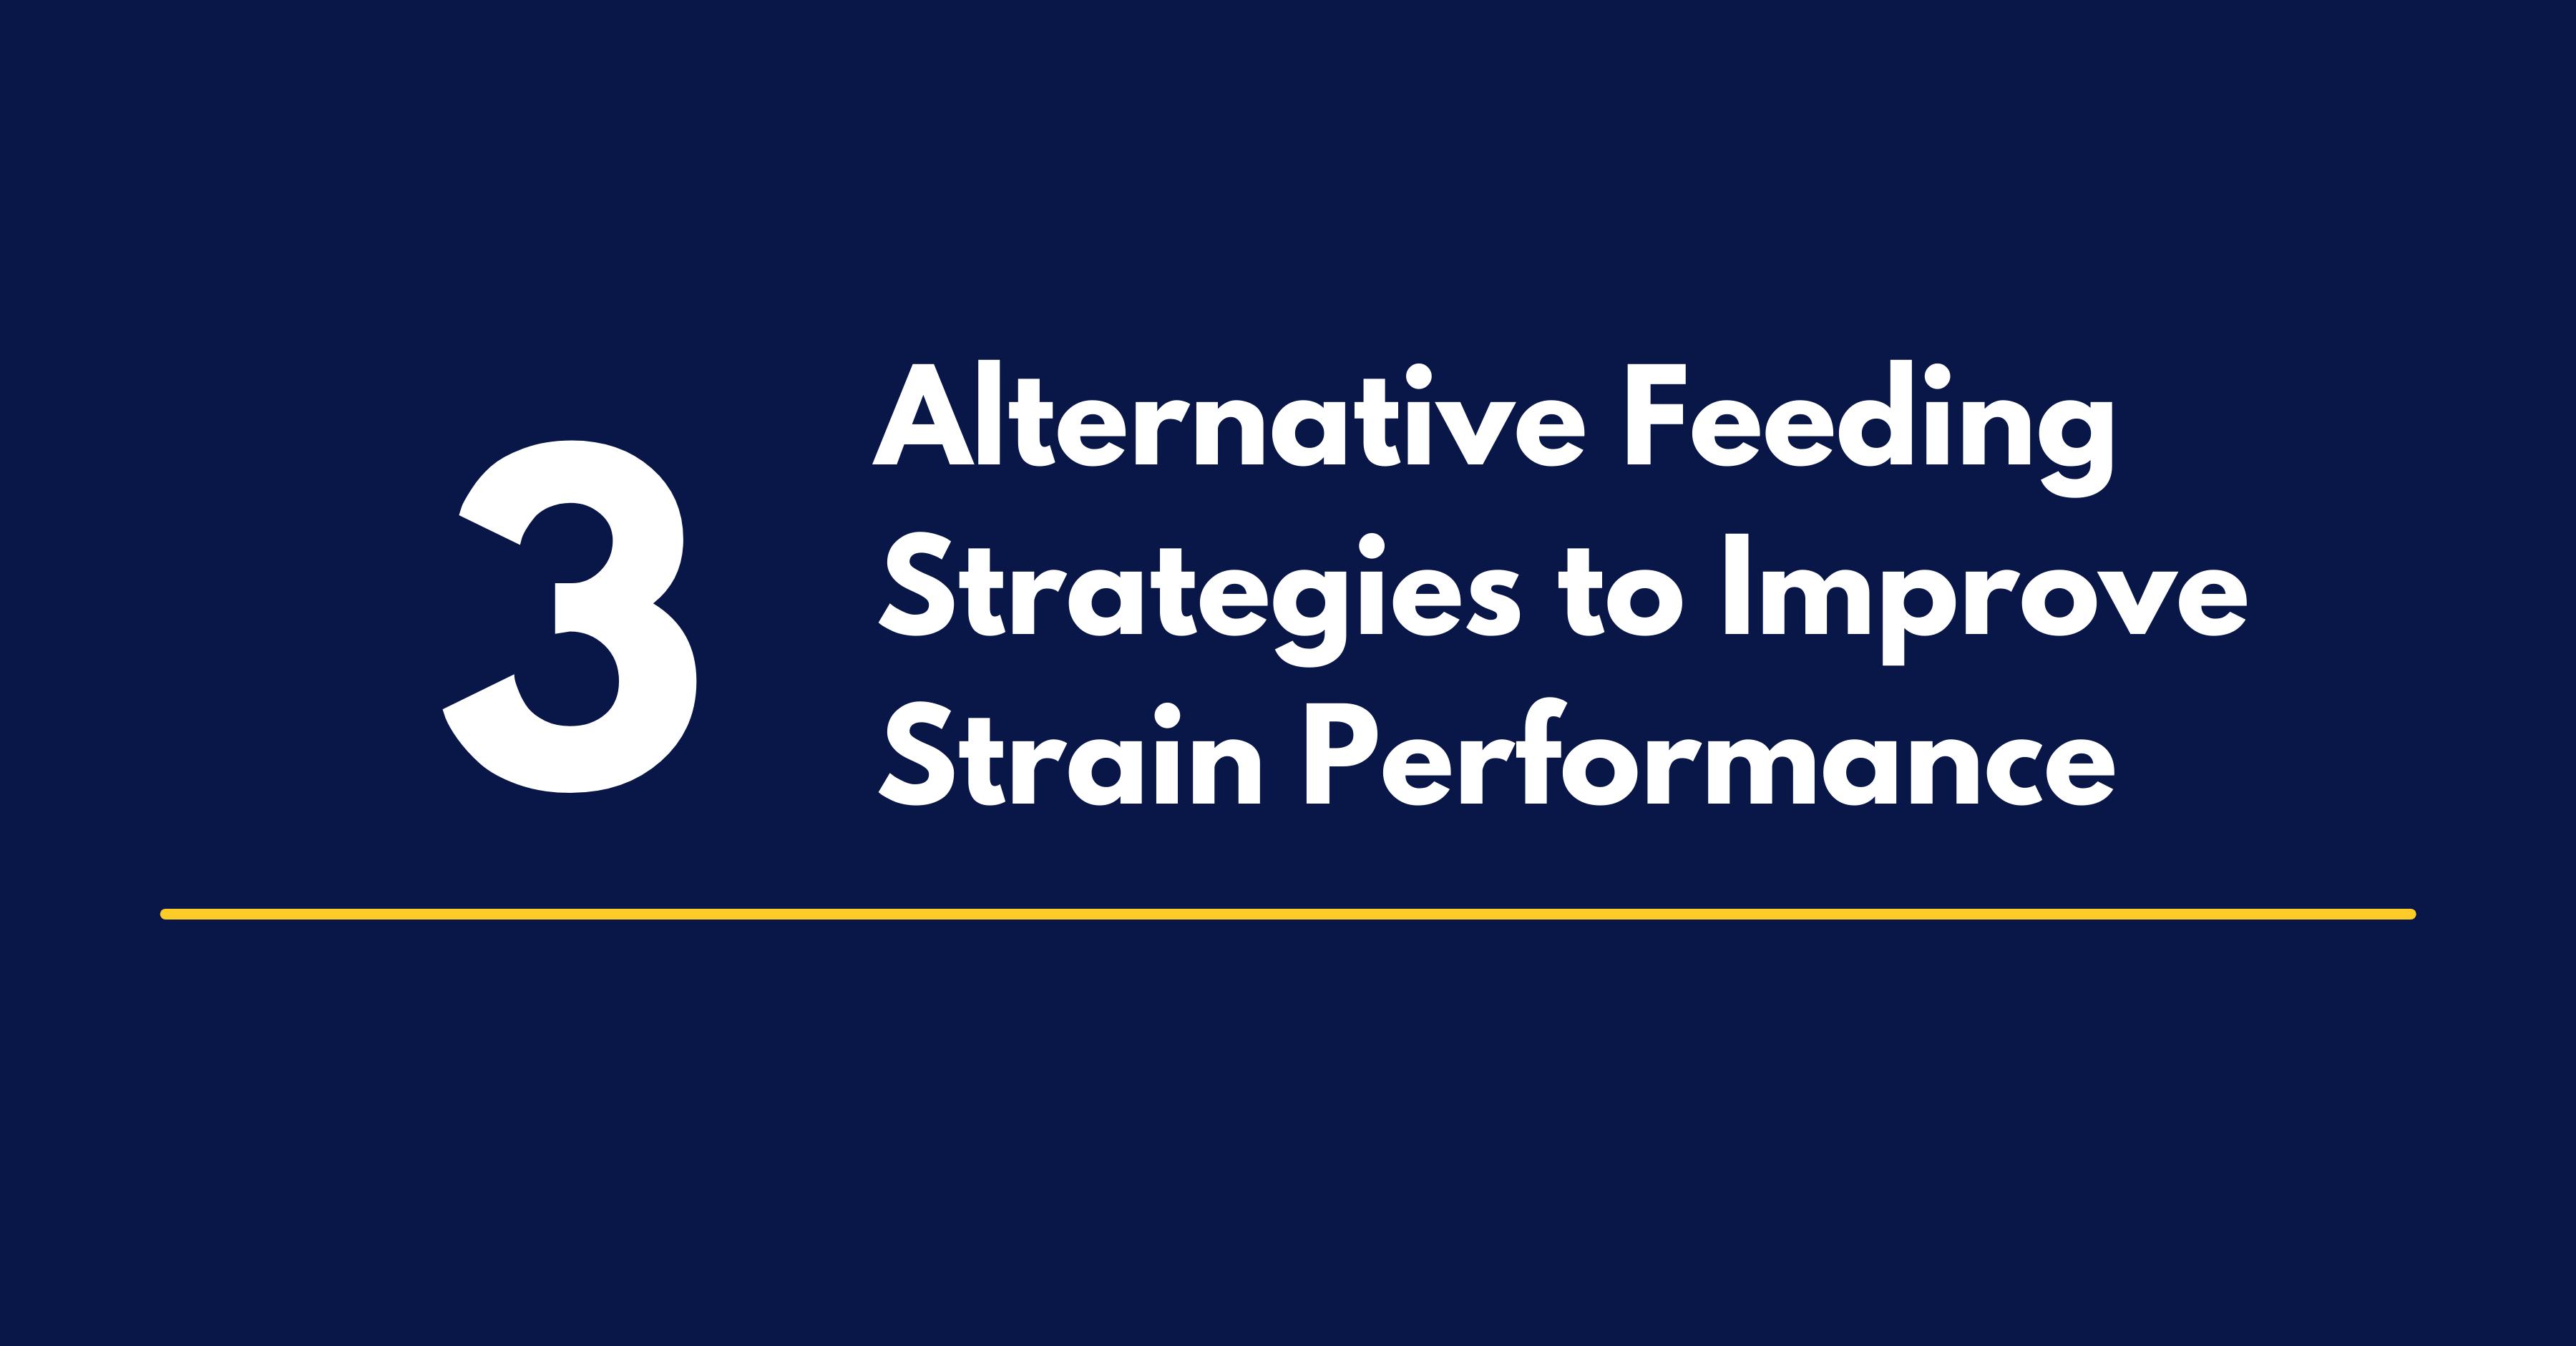 3 Alternative Feeding Strategies to Improve Strain Performance